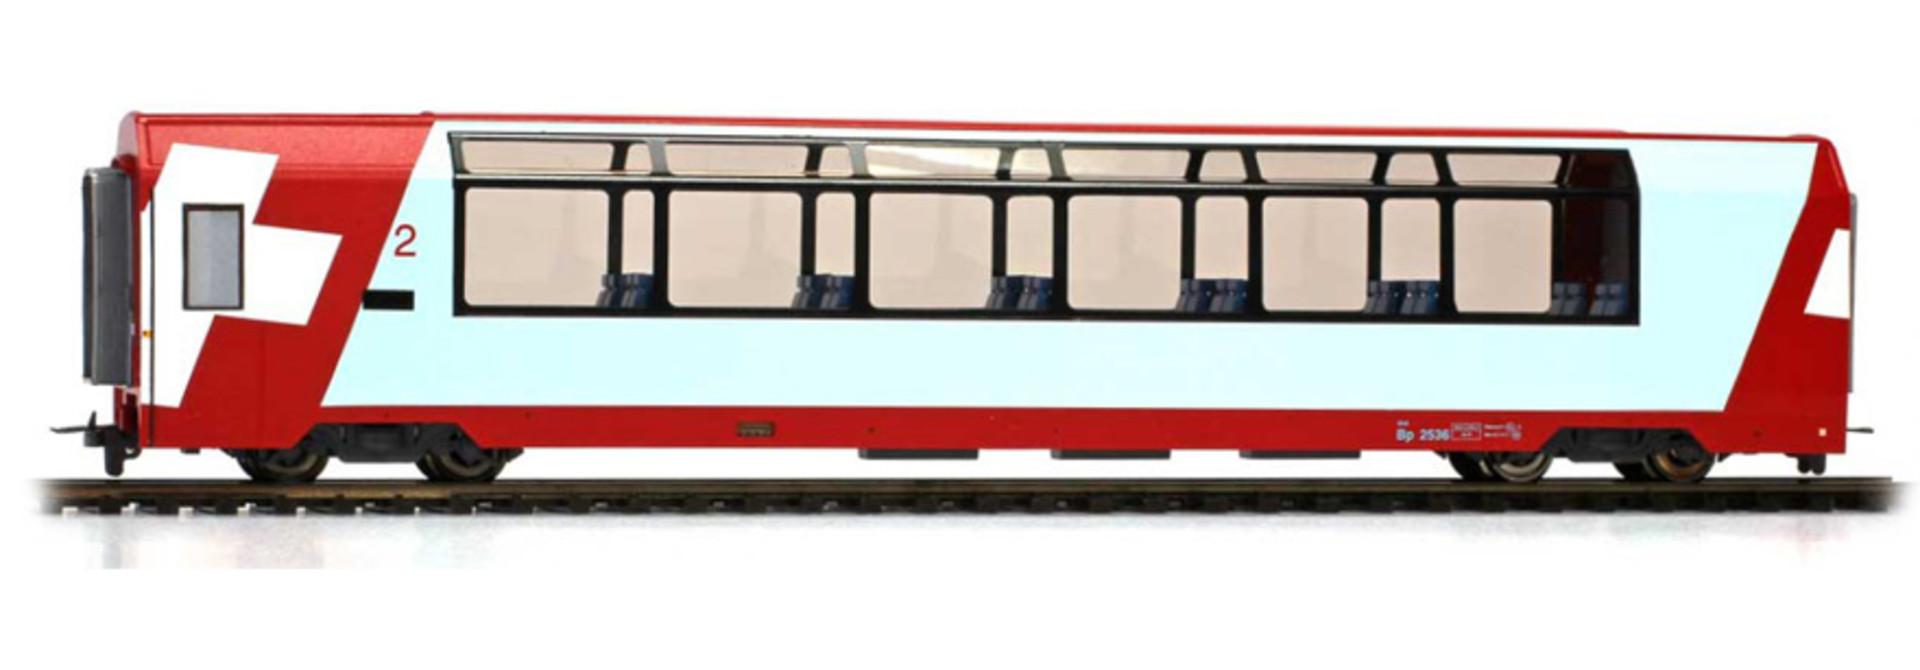 "3689127 RhB Bp 2537 ""Glacier Express"" H0 2L-GS"